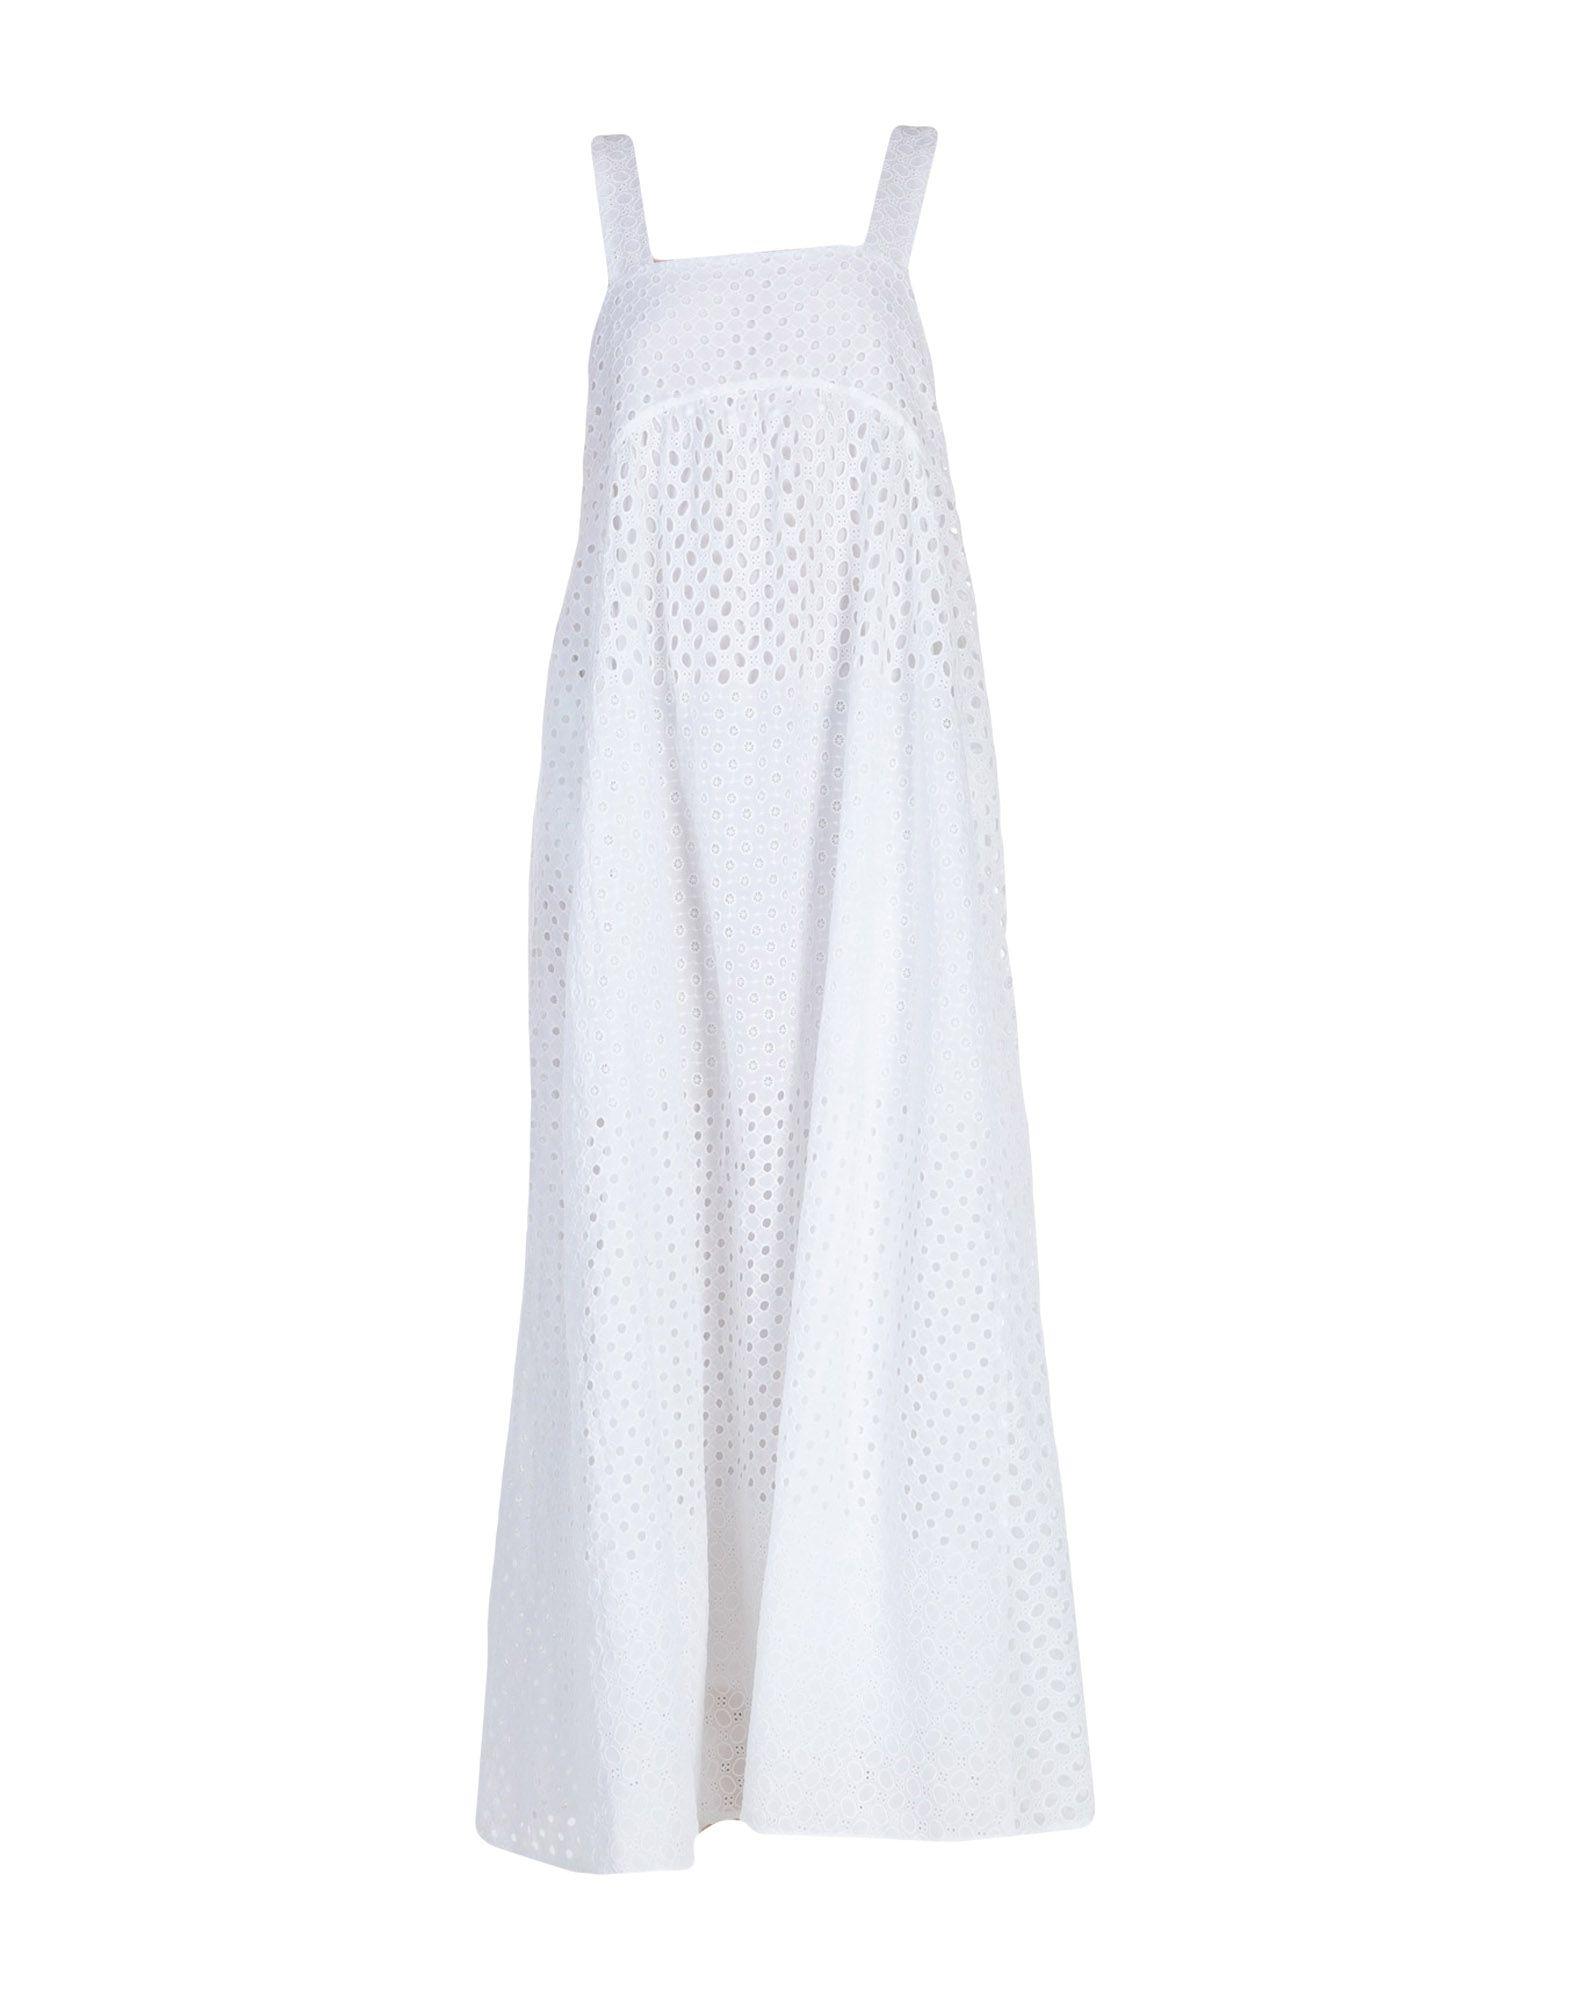 22f4fed6caa3 Γυναικεία Φορέματα - Σελίδα 2176   Outfit.gr